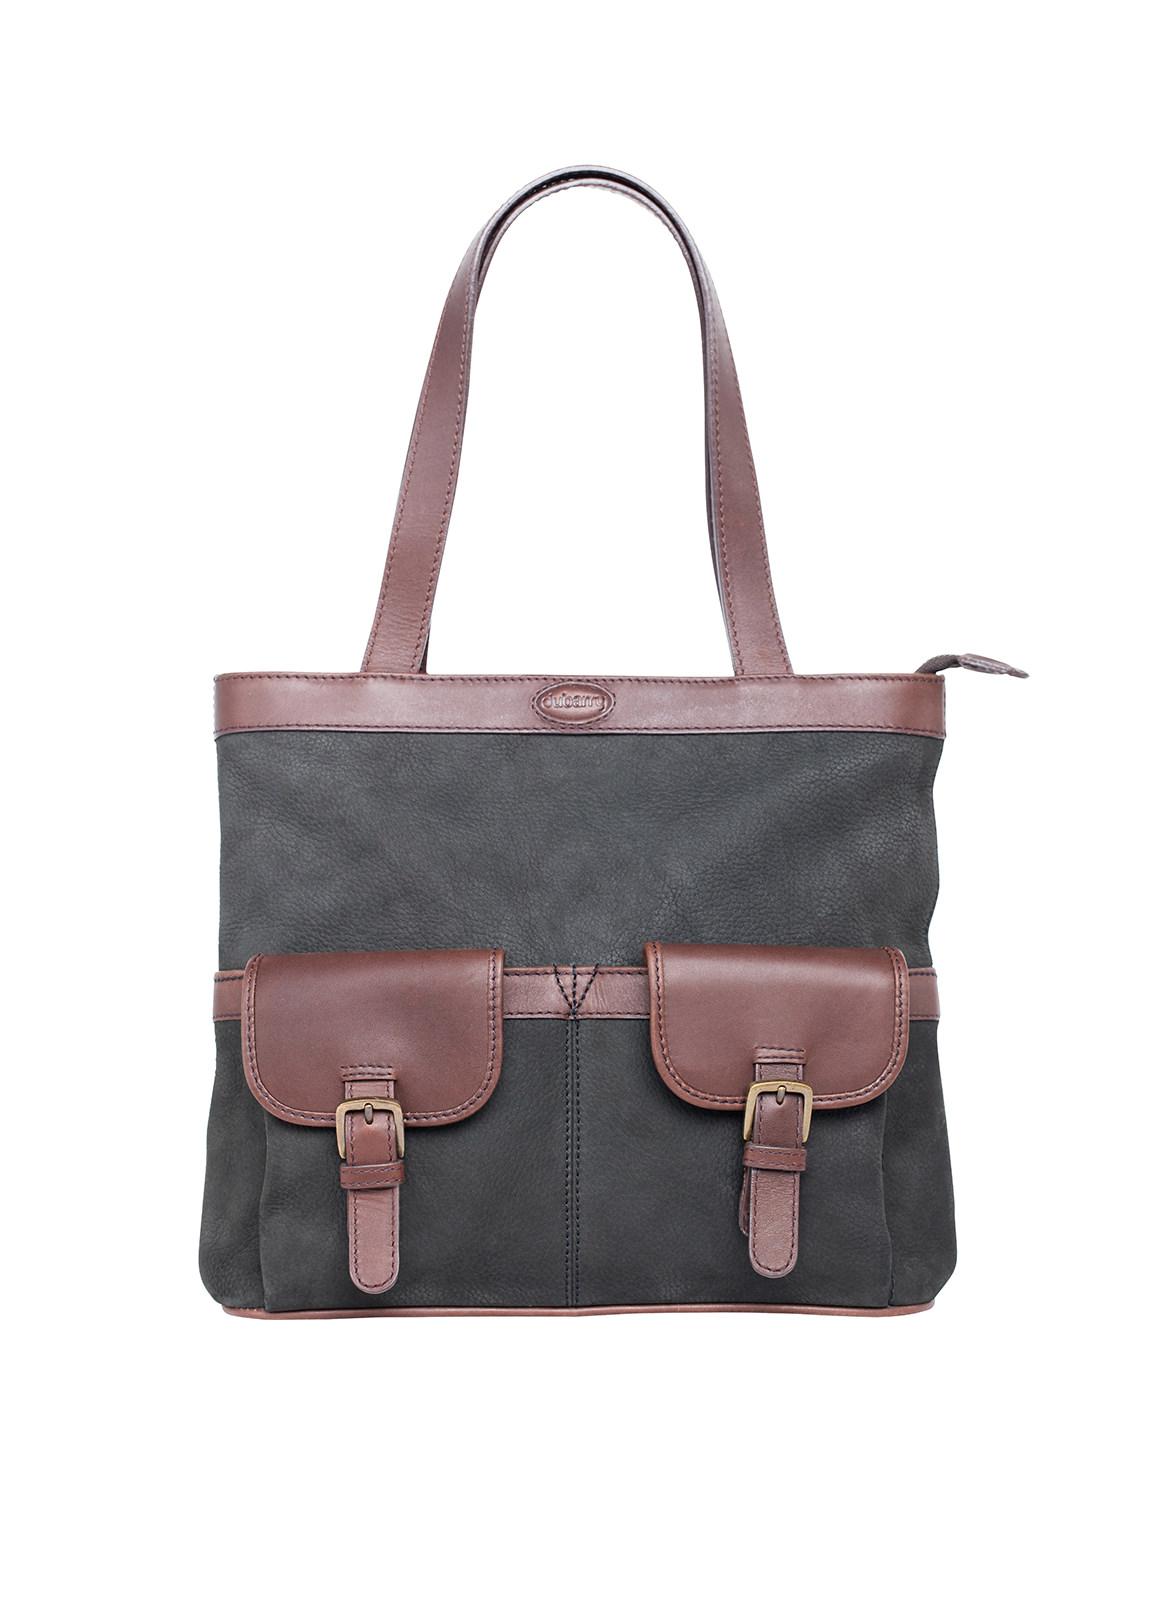 Dubarry_ Raheen Tote-Style Shoulder Bag - Black/Brown_Image_1